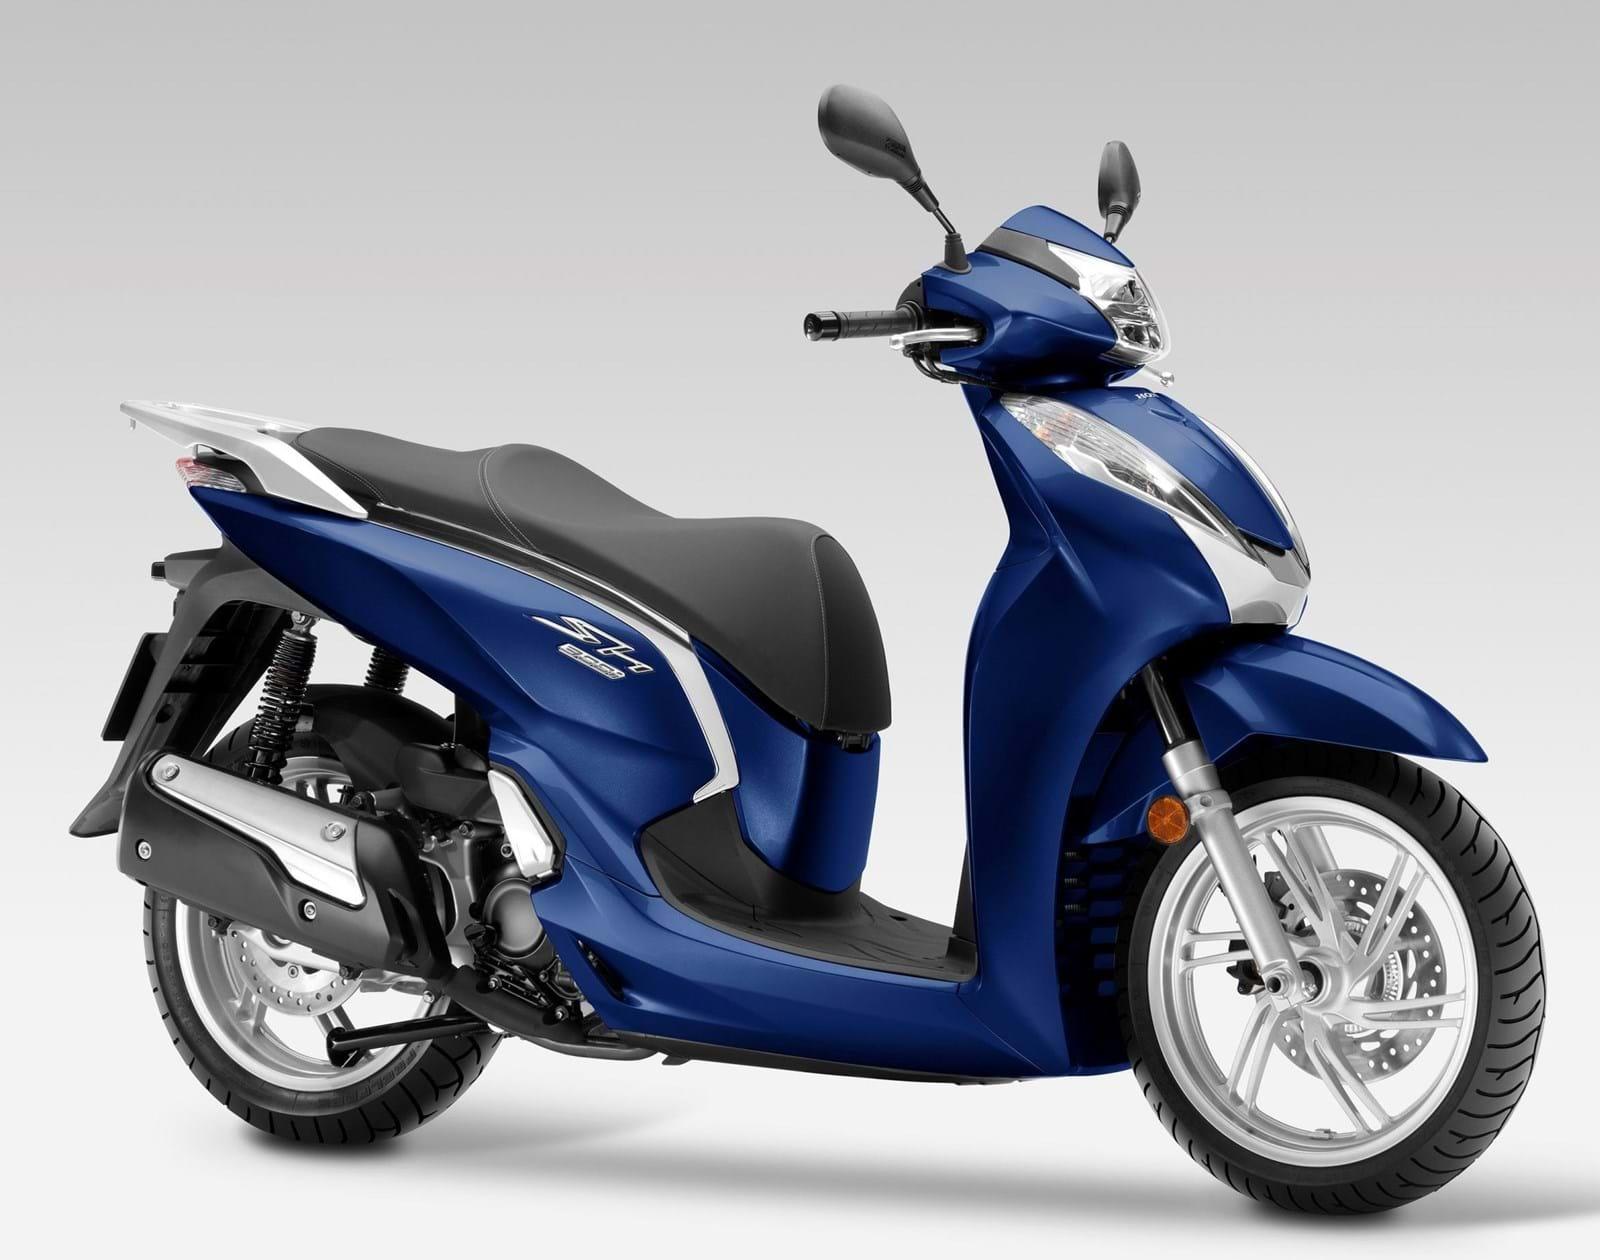 For Sale: Honda SH300i • The Bike Market